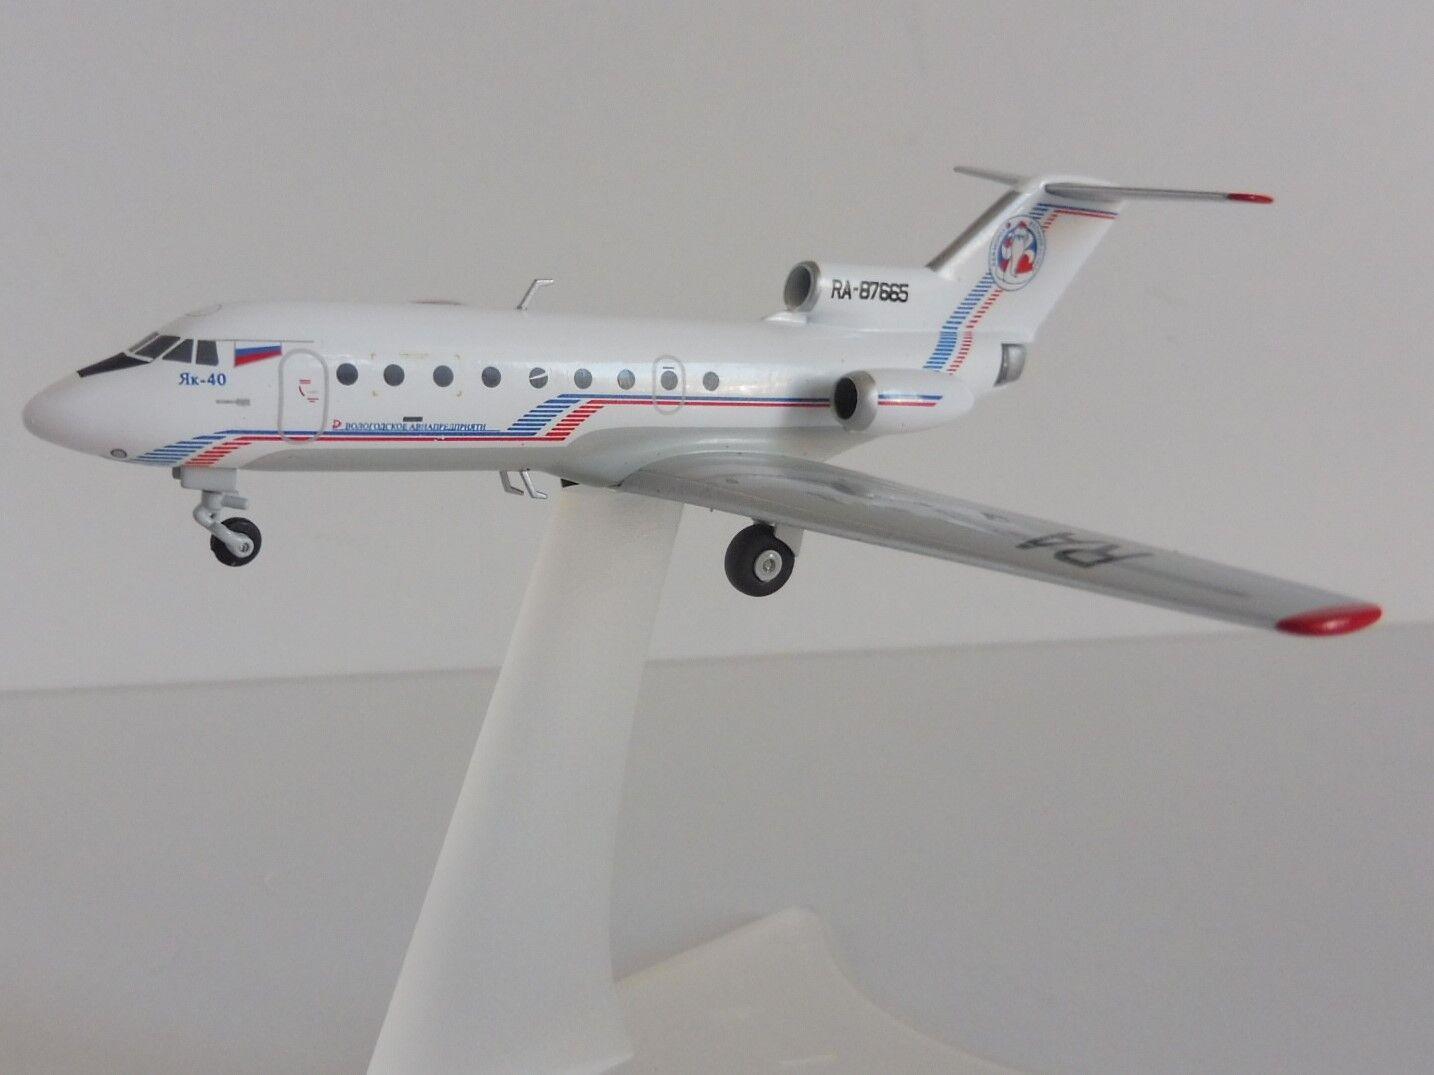 Yakovlev Yak-40 Vologda Air Société Dez Morz 1 200 Herpa 558235 Jakowlew